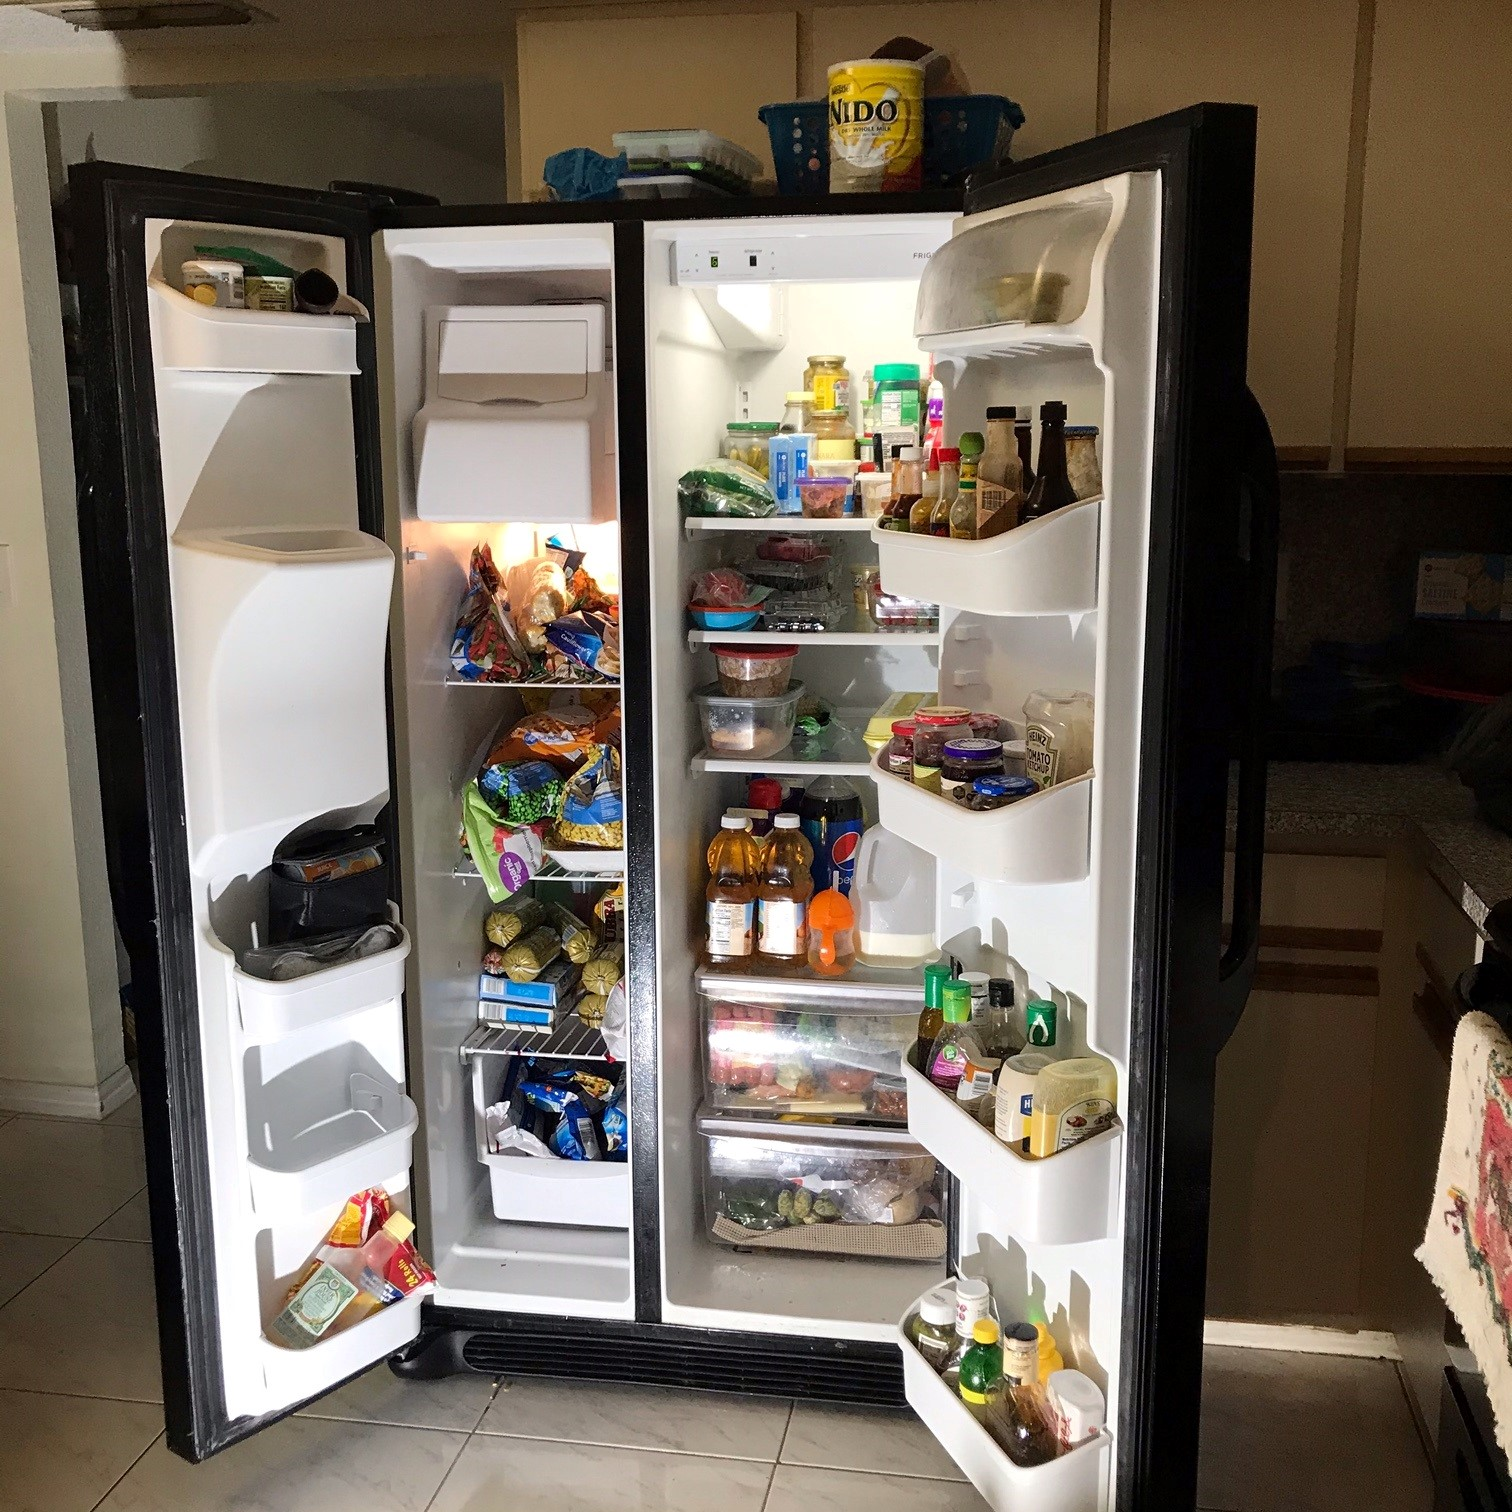 appliance repair refrigerator repair freezer not freezing summerland avenue winter park 32789